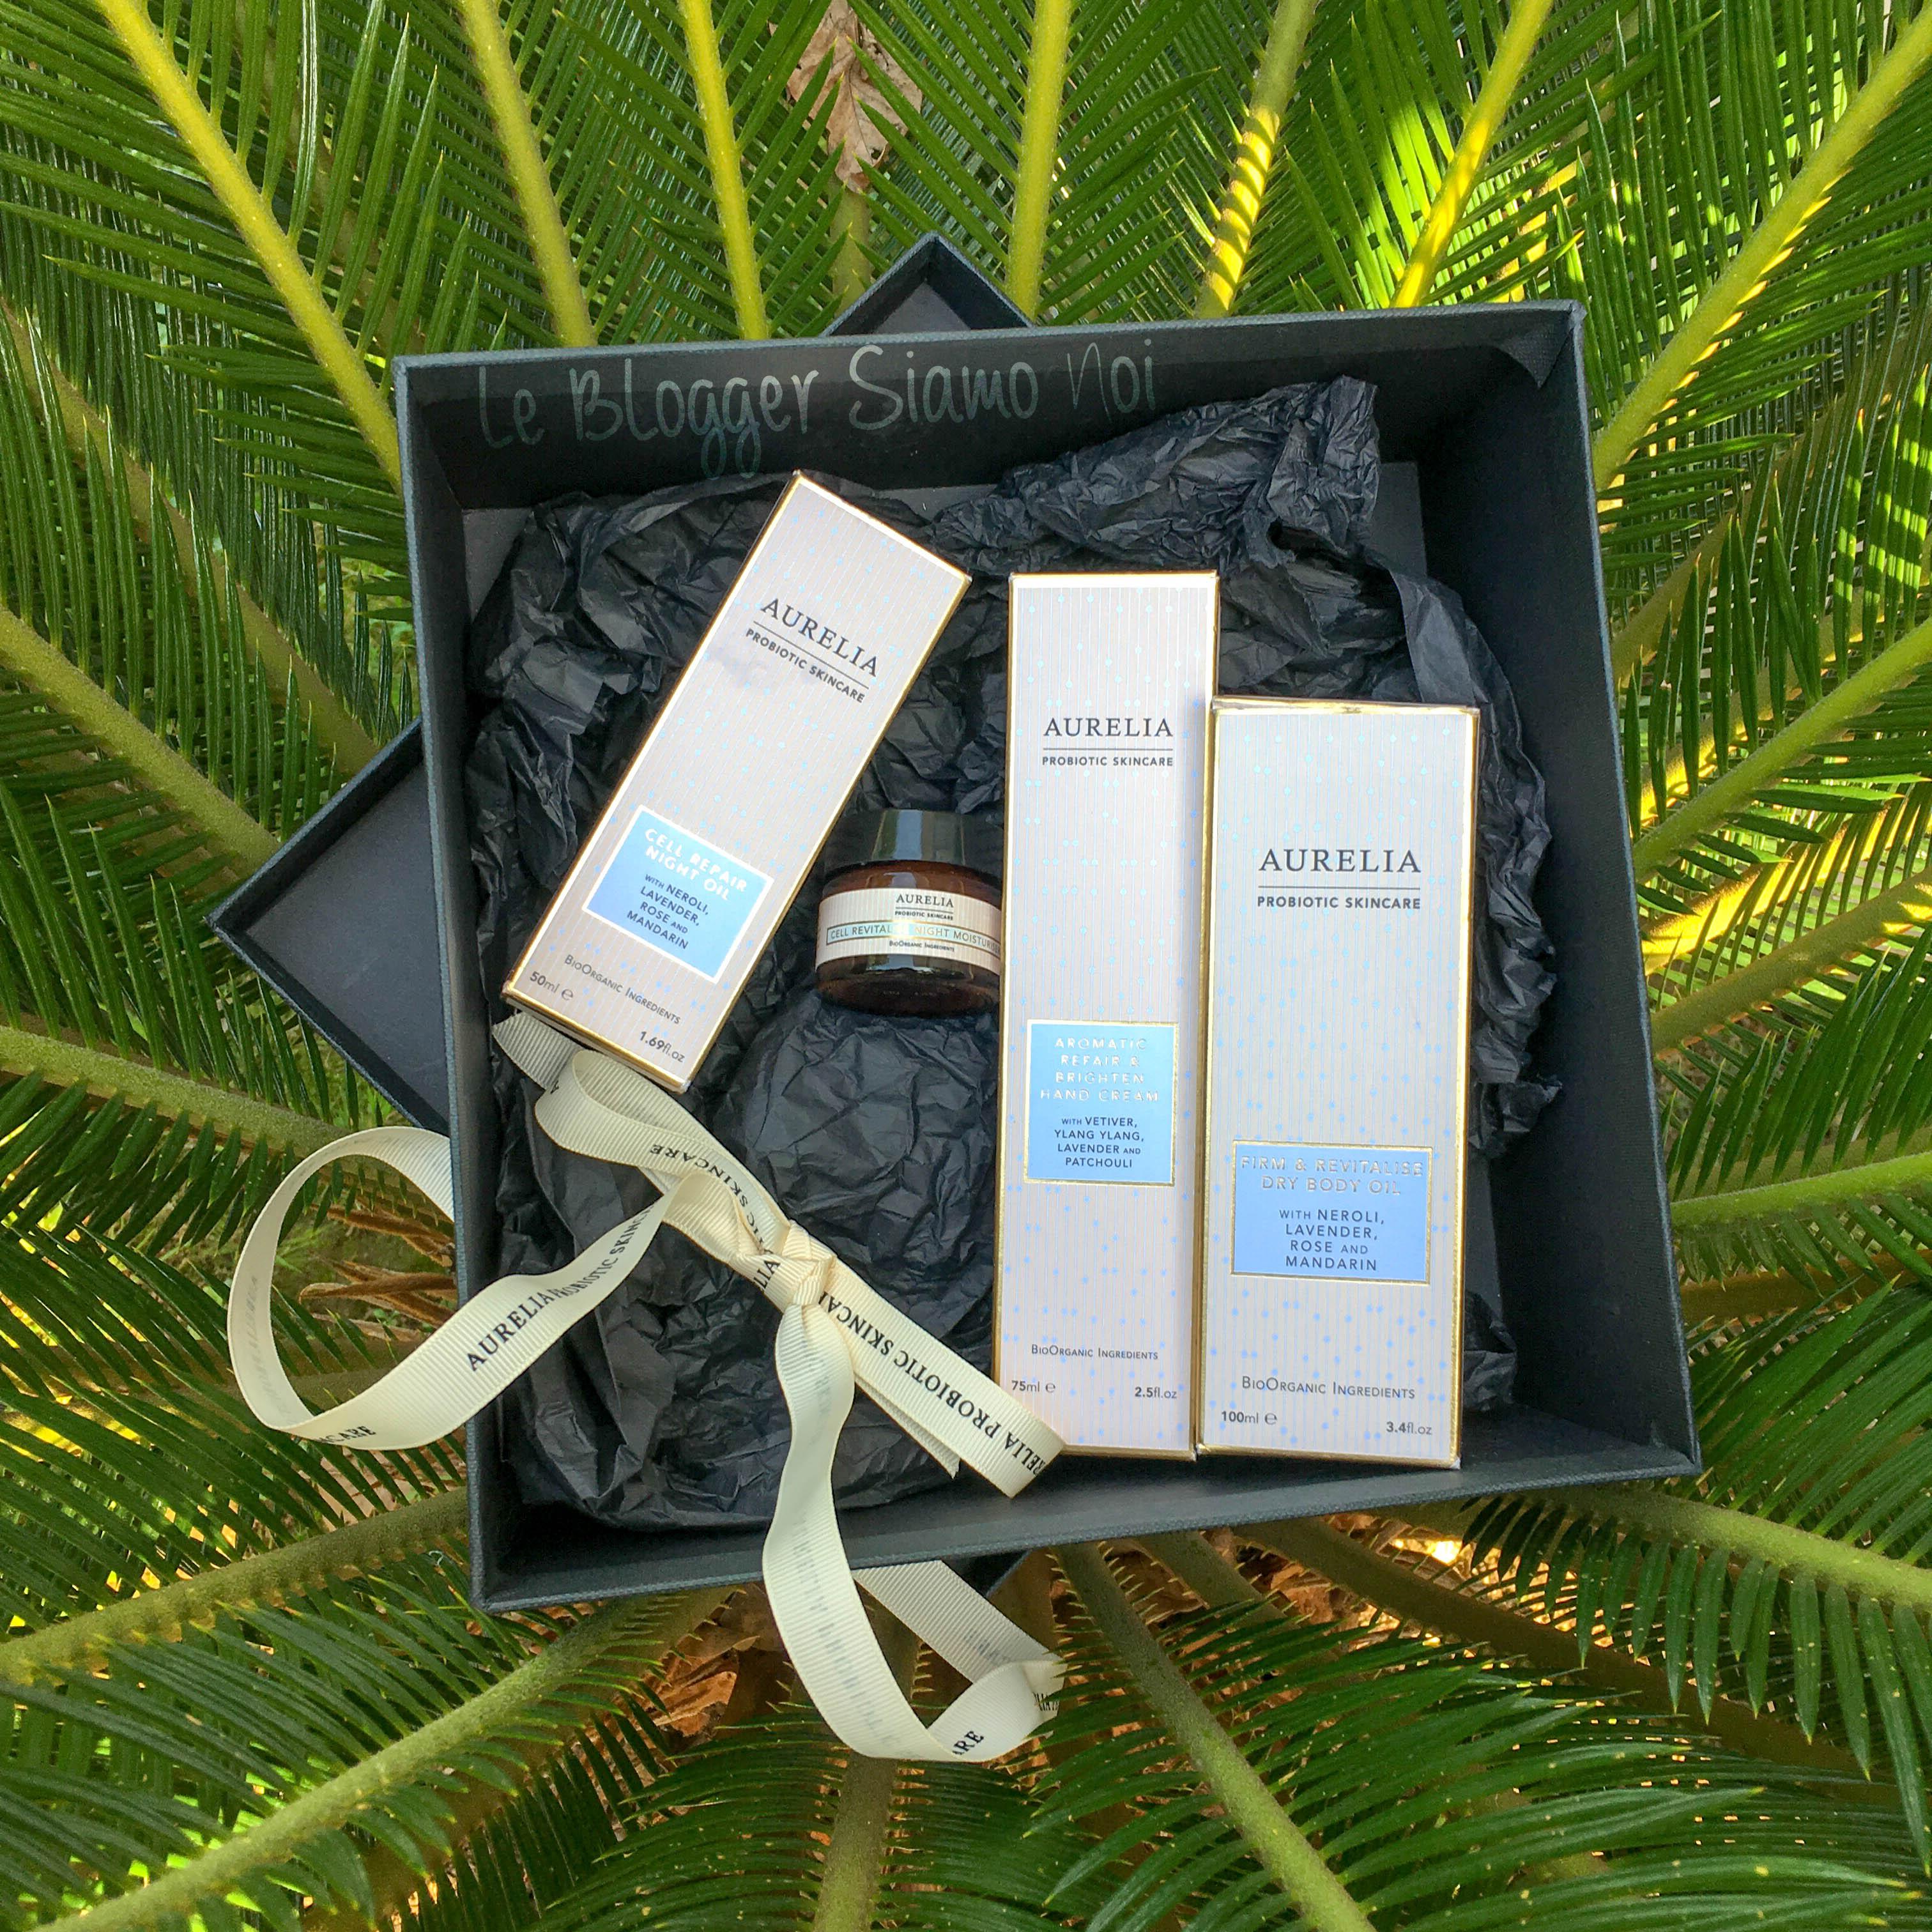 Nourish e Glow Collection – Aurelia Probiotic Skincare